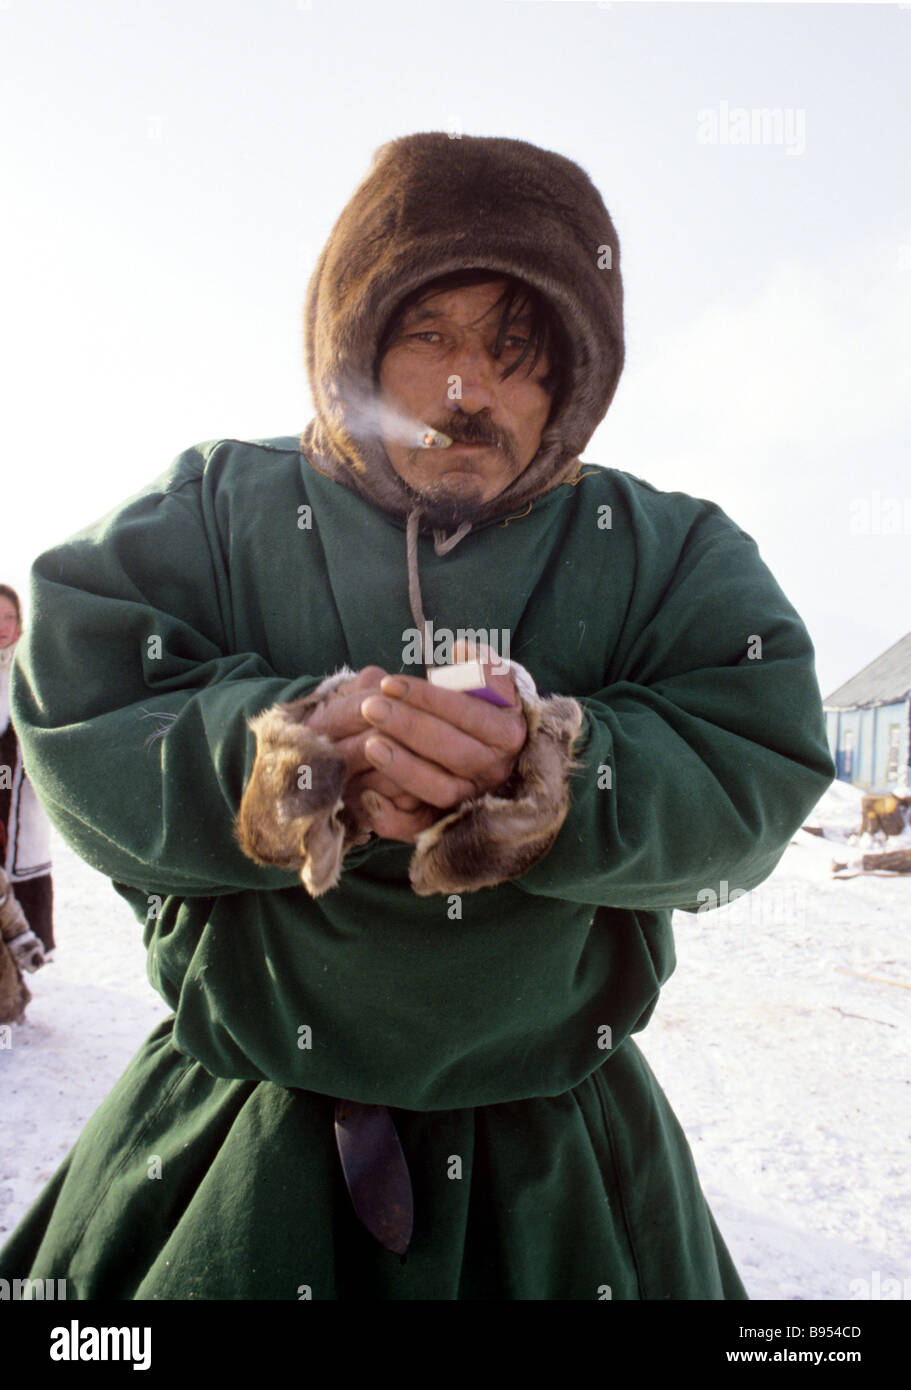 Khanty reindeer breeder Ivan Laplander from the state farm Baidaratsky of Priuralsky district - Stock Image